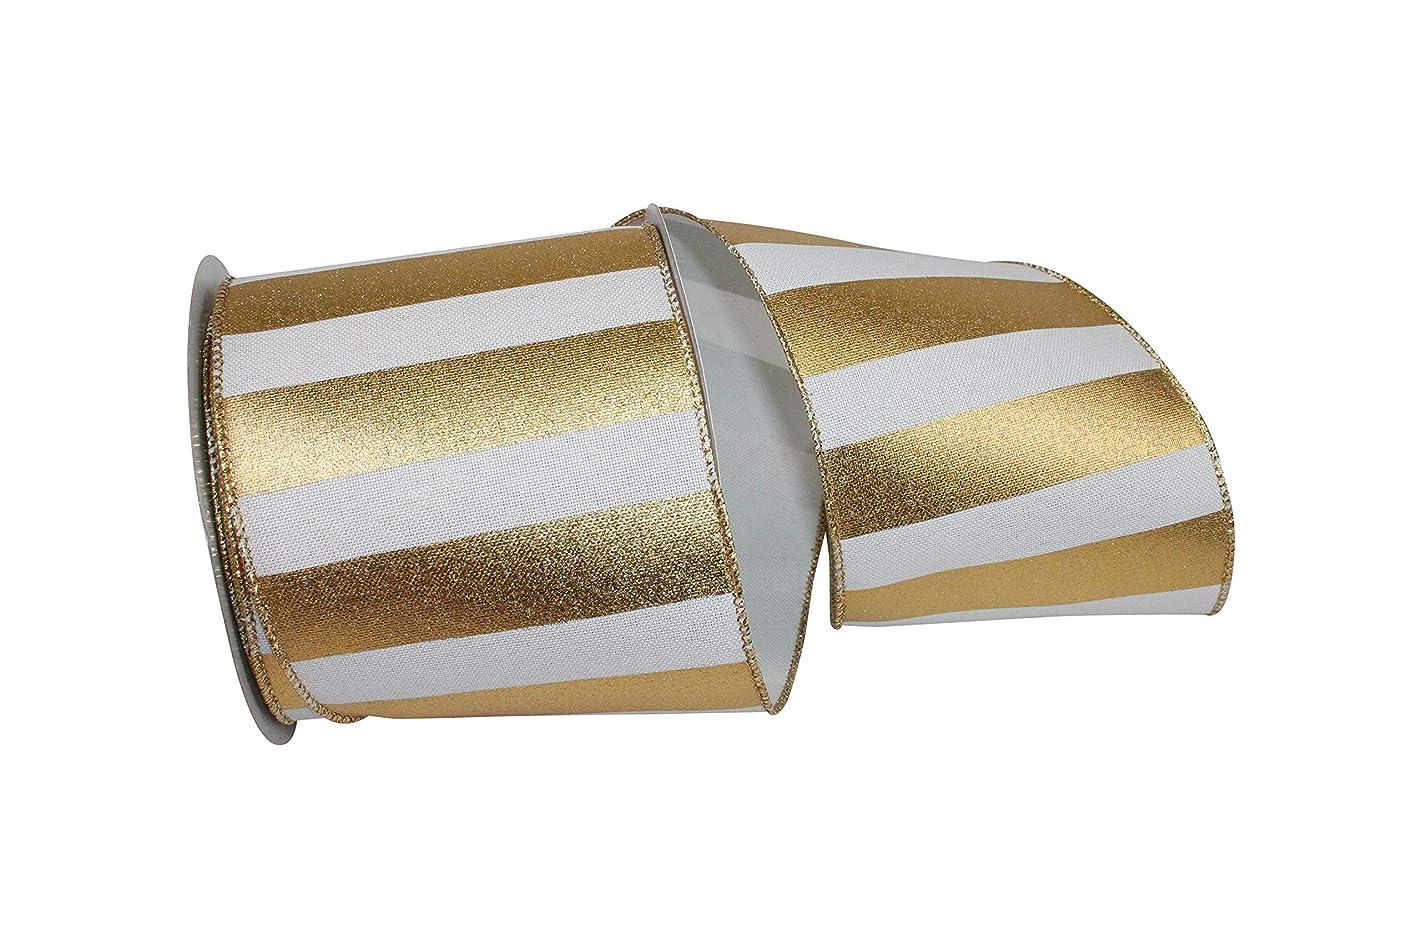 Reliant Ribbon 93166W-980-10F Gold Bar Metallic Linen Wired Edge Ribbon, 4 Inch X 10 Yards, White